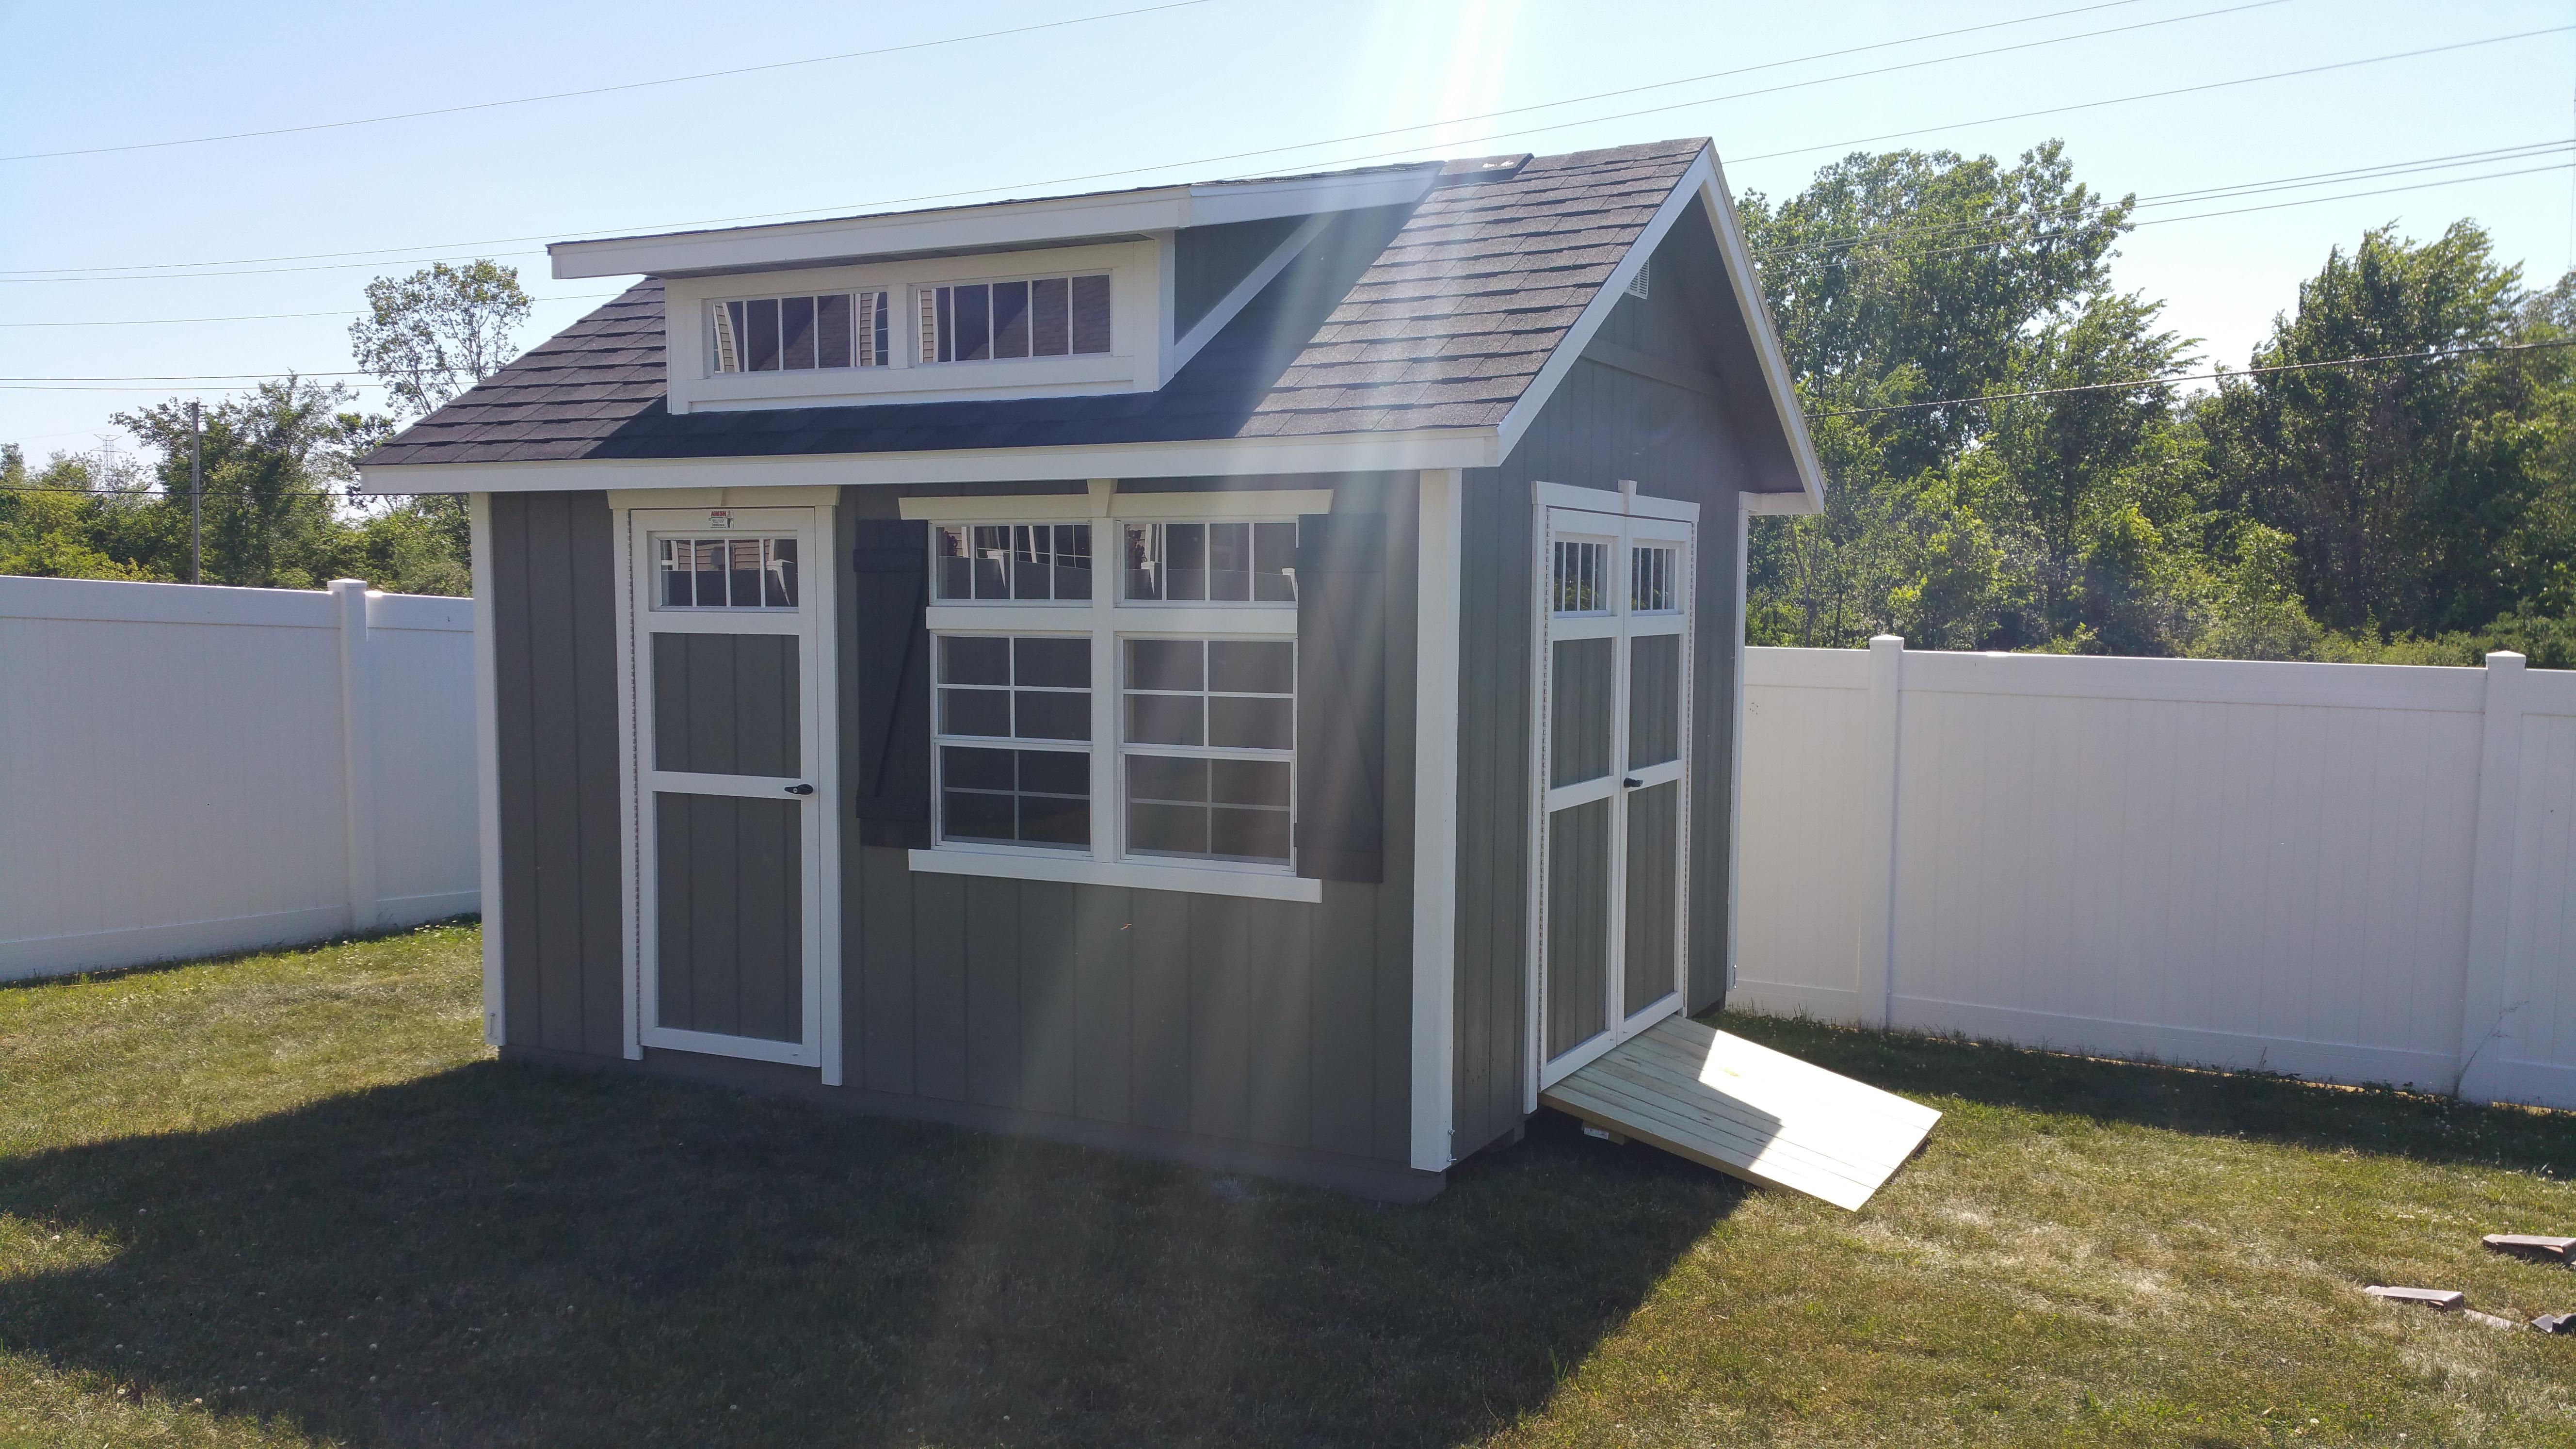 10x12 Garden Shed W Double Transom Dormer